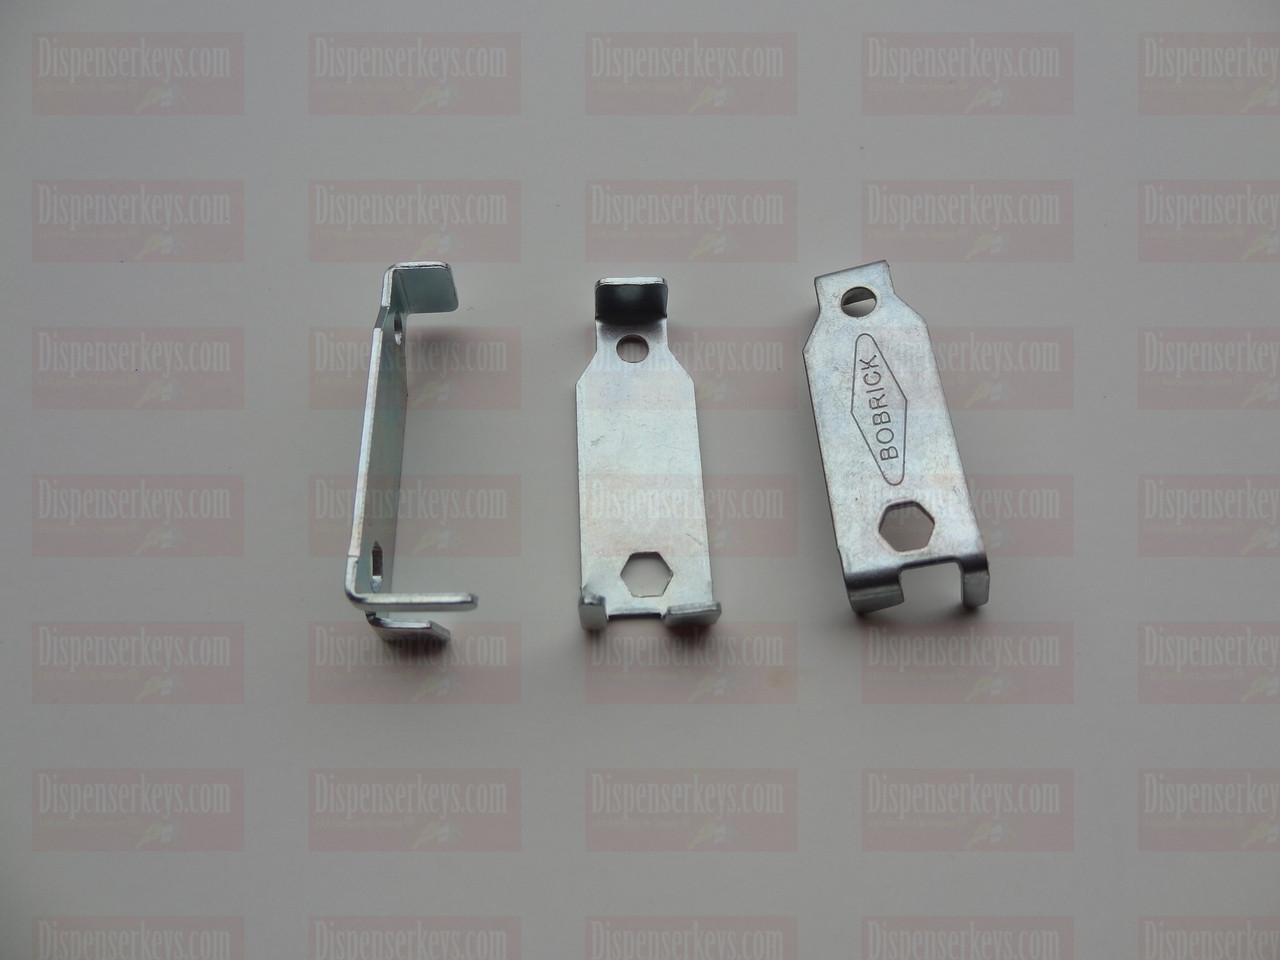 Bobrick Master Dispenser Key Set for Paper Towel Toilet Tissue /& Soap Disp.